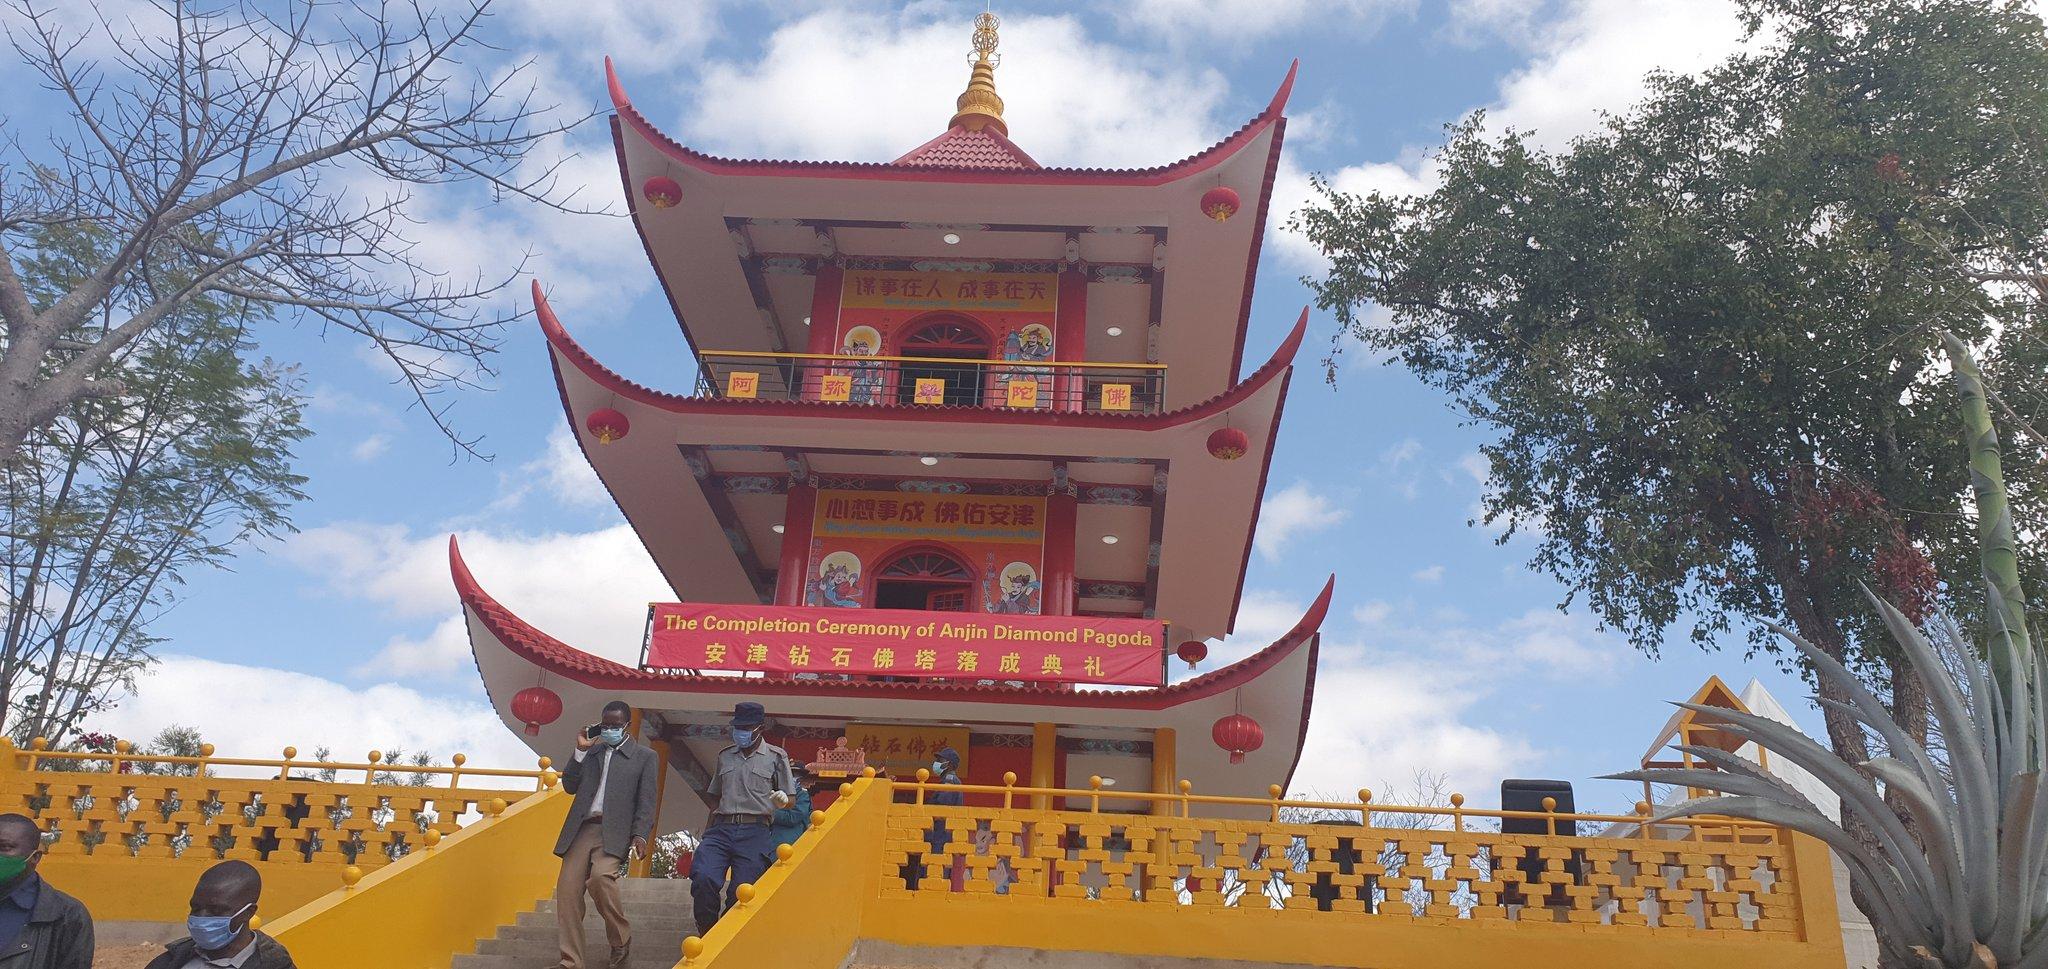 Anjin Diamond Pagoda